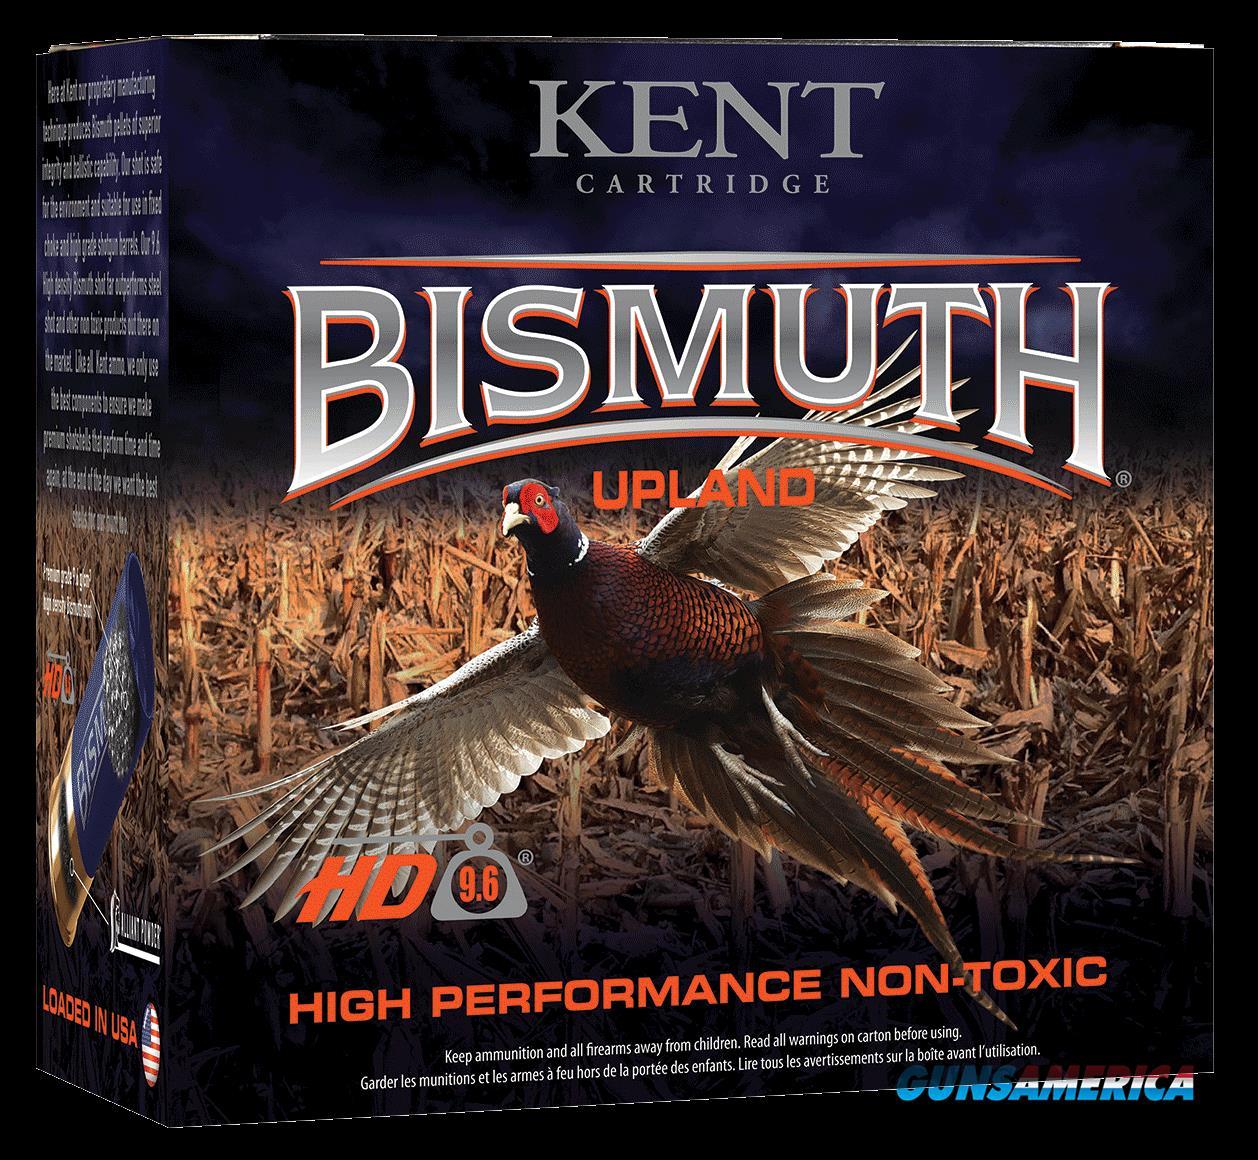 Kent Cartridge Bismuth, Kent B28u246    2.75  7-8  Bismt Upland      25-10  Guns > Pistols > 1911 Pistol Copies (non-Colt)